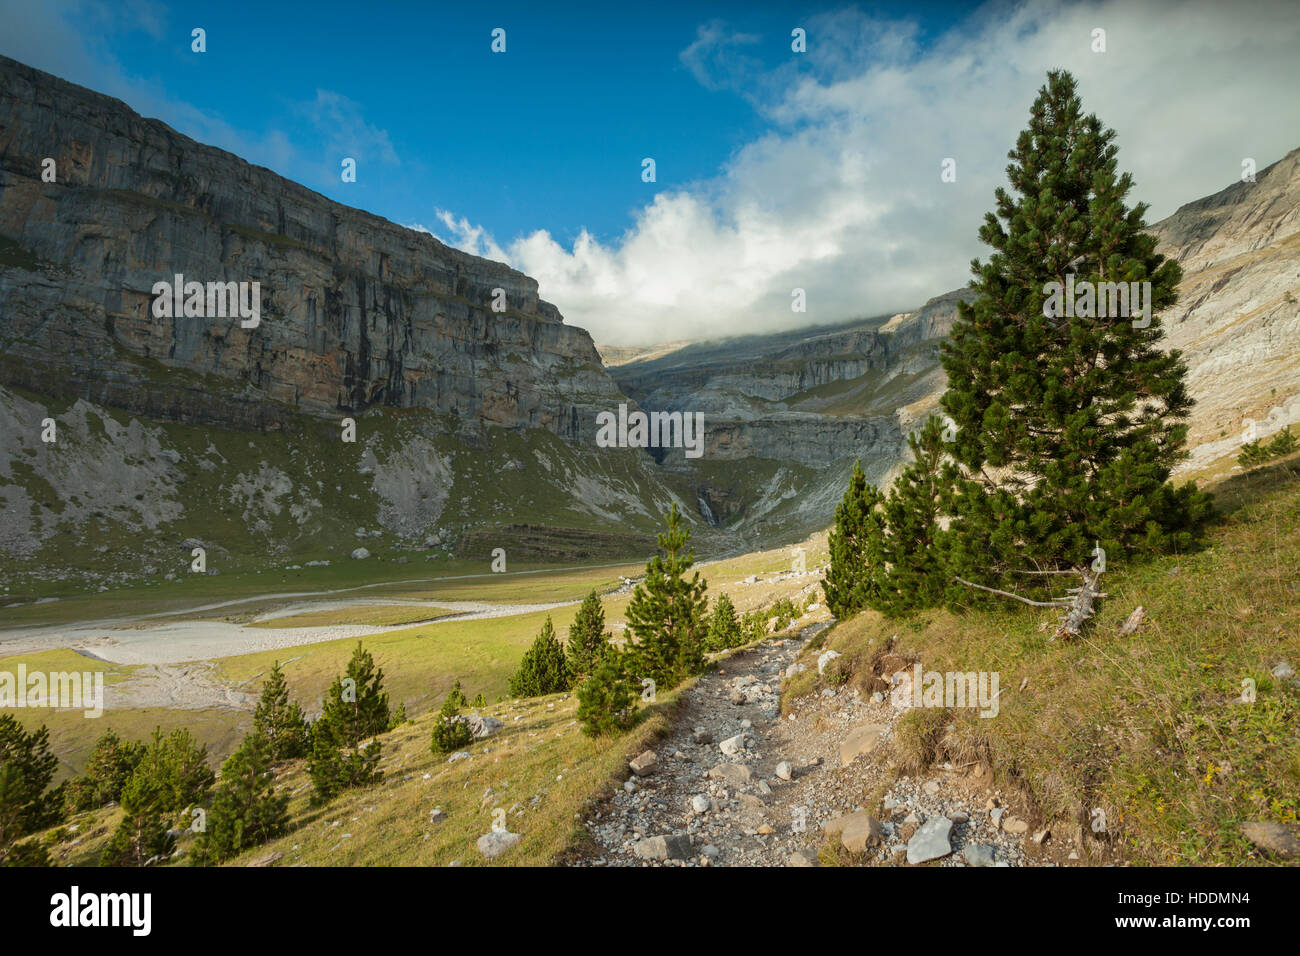 Ordesa y Monte Perdido National Park, Huesca, Aragon, Spain, Pyrenees mountains. Stock Photo